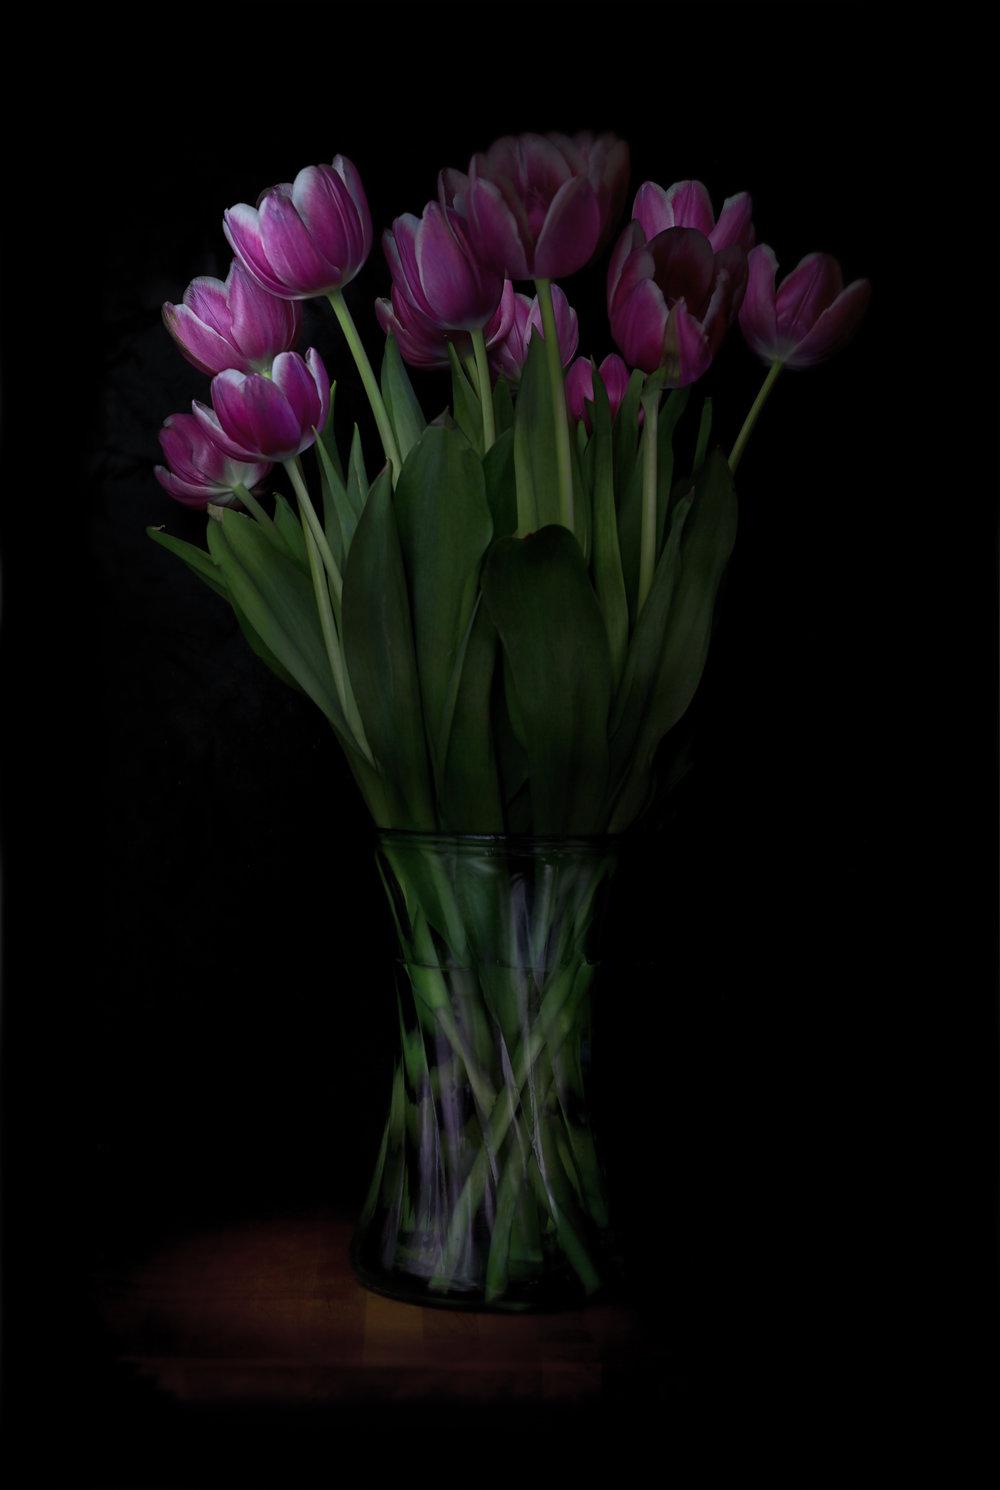 tulips 9.jpg